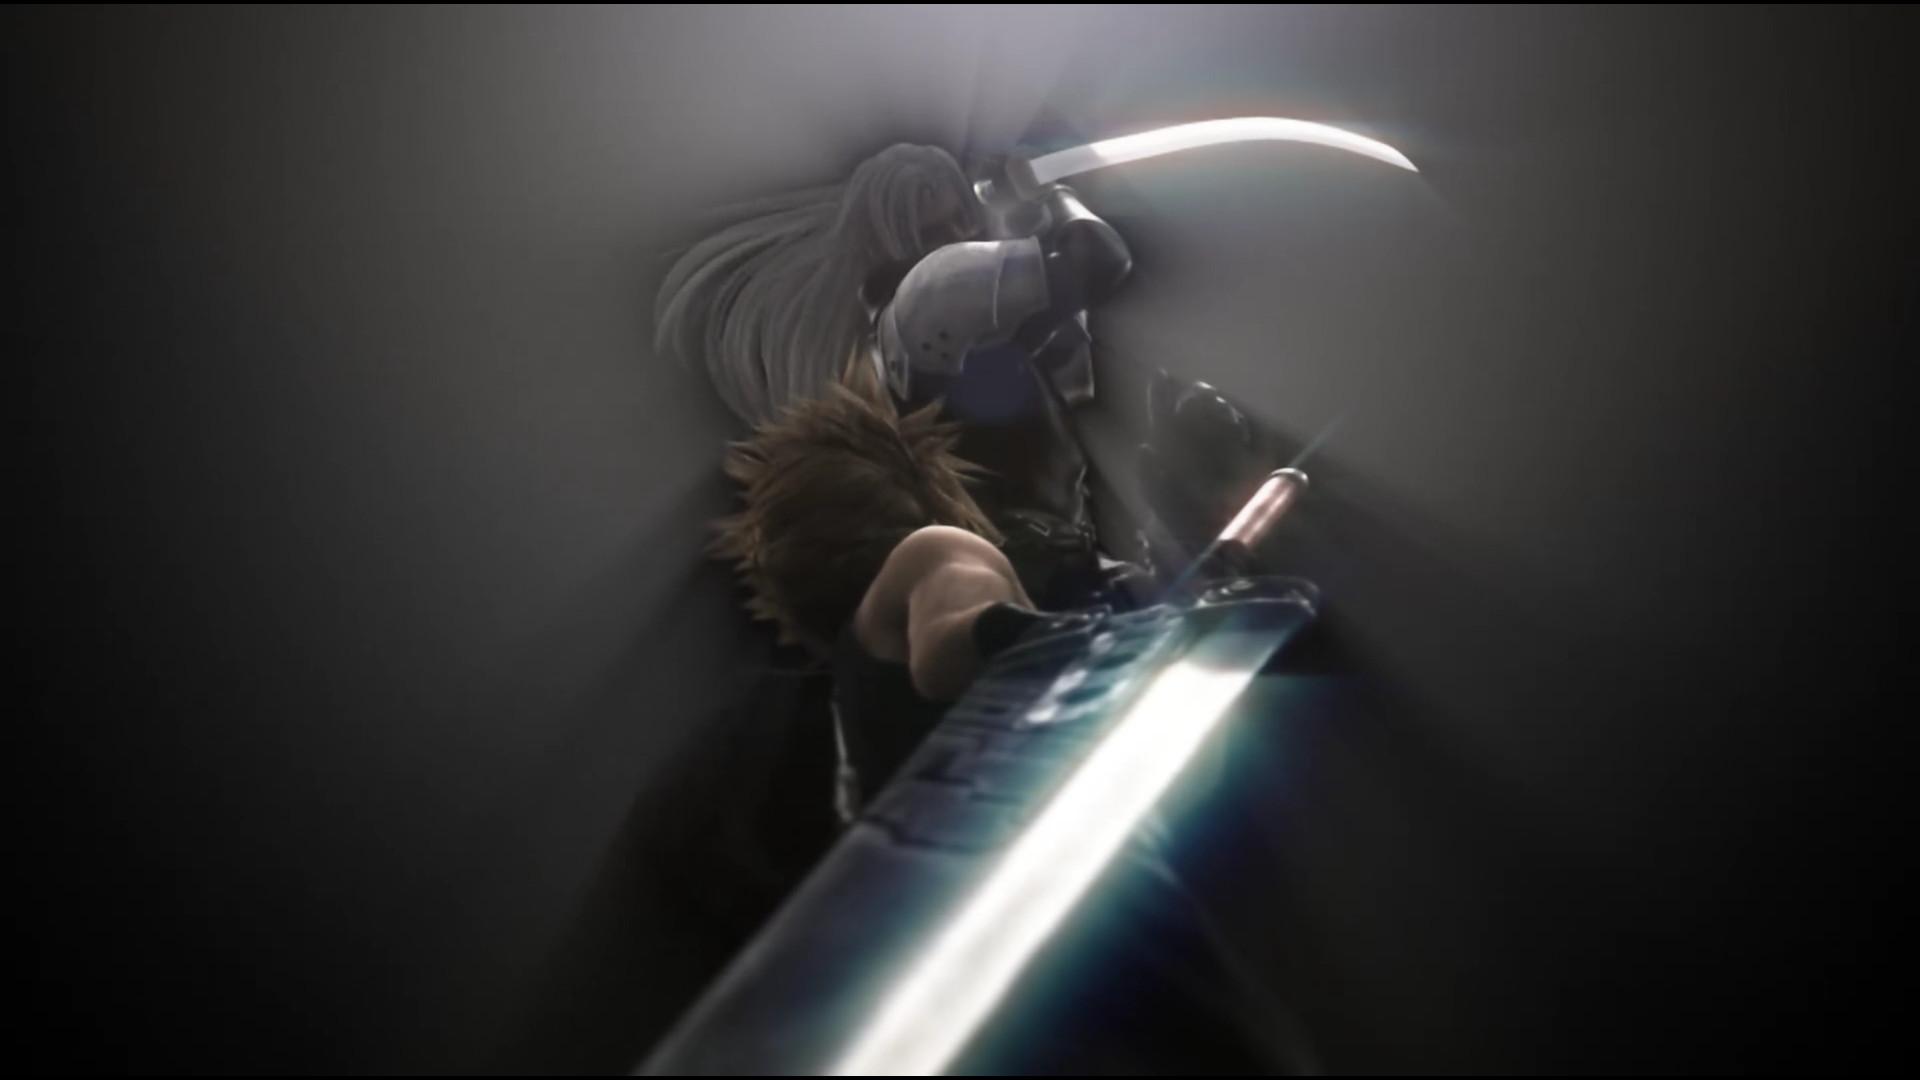 Full FHDQ Photos: Final Fantasy VII Remake, 1920×1080